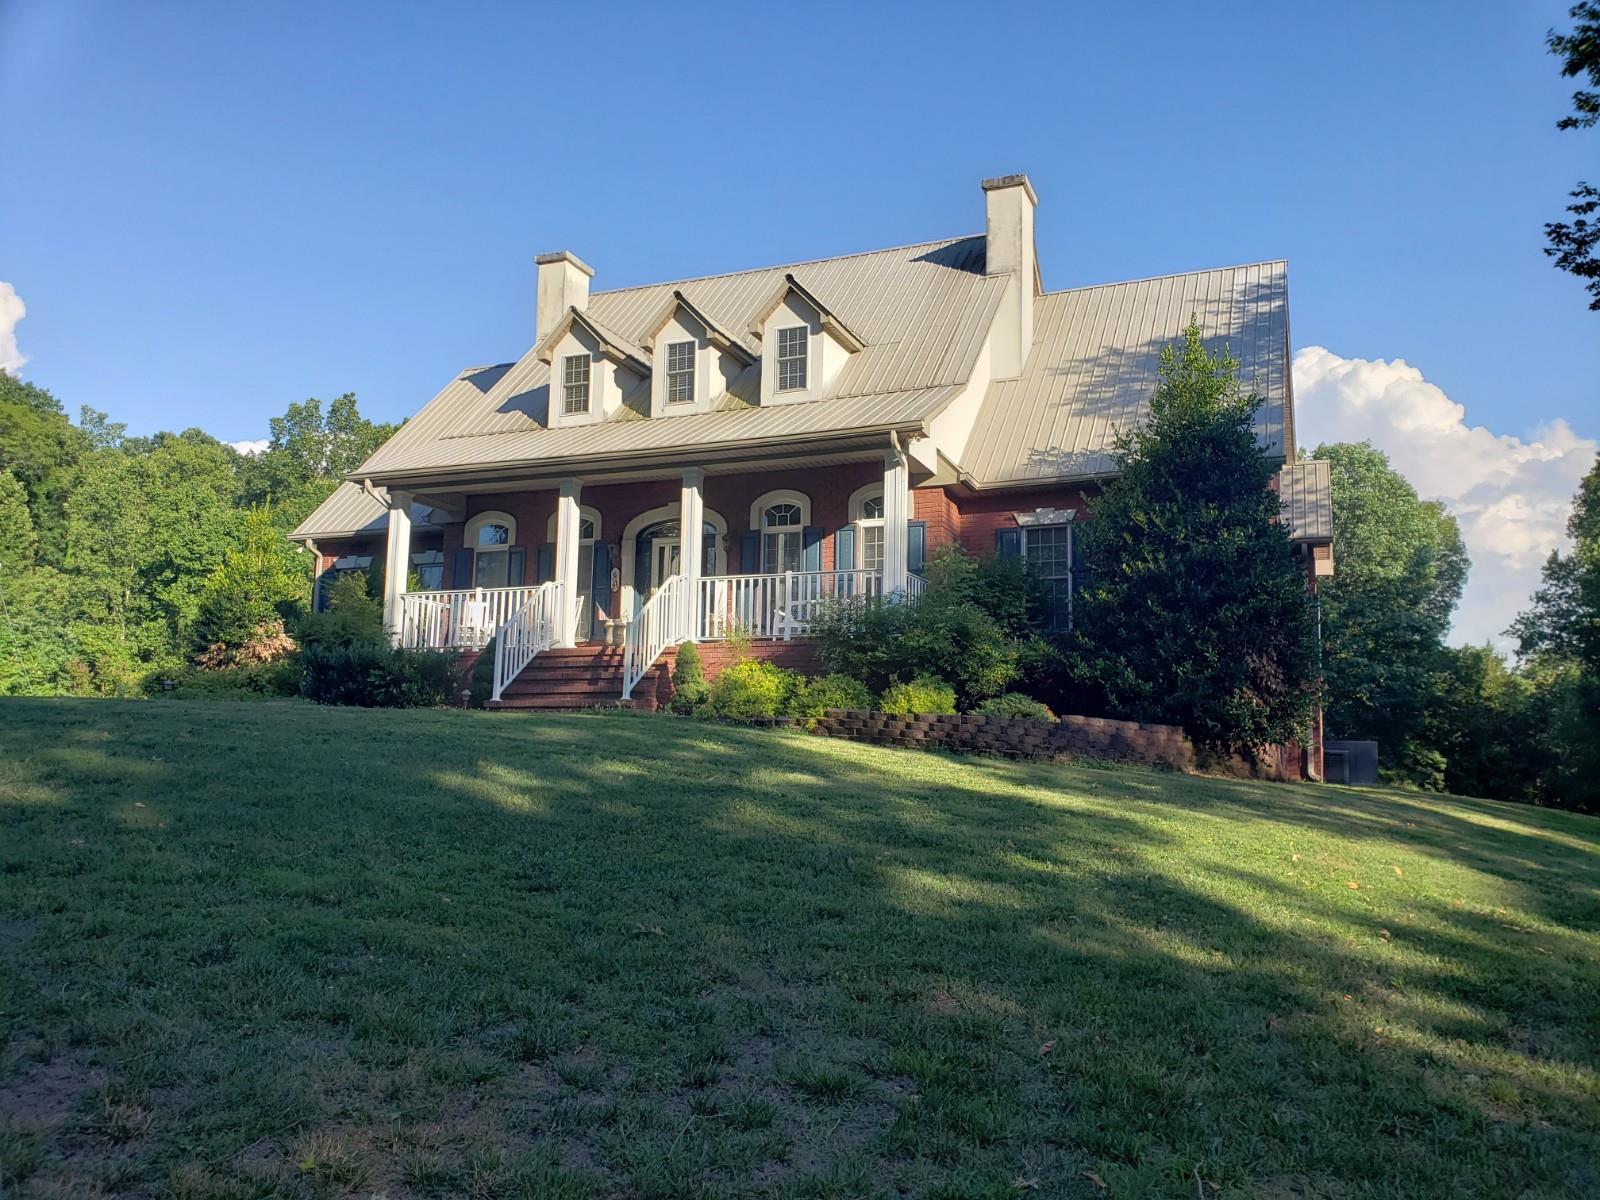 320 Overlook Dr, Sparta, TN 38583 - Sparta, TN real estate listing